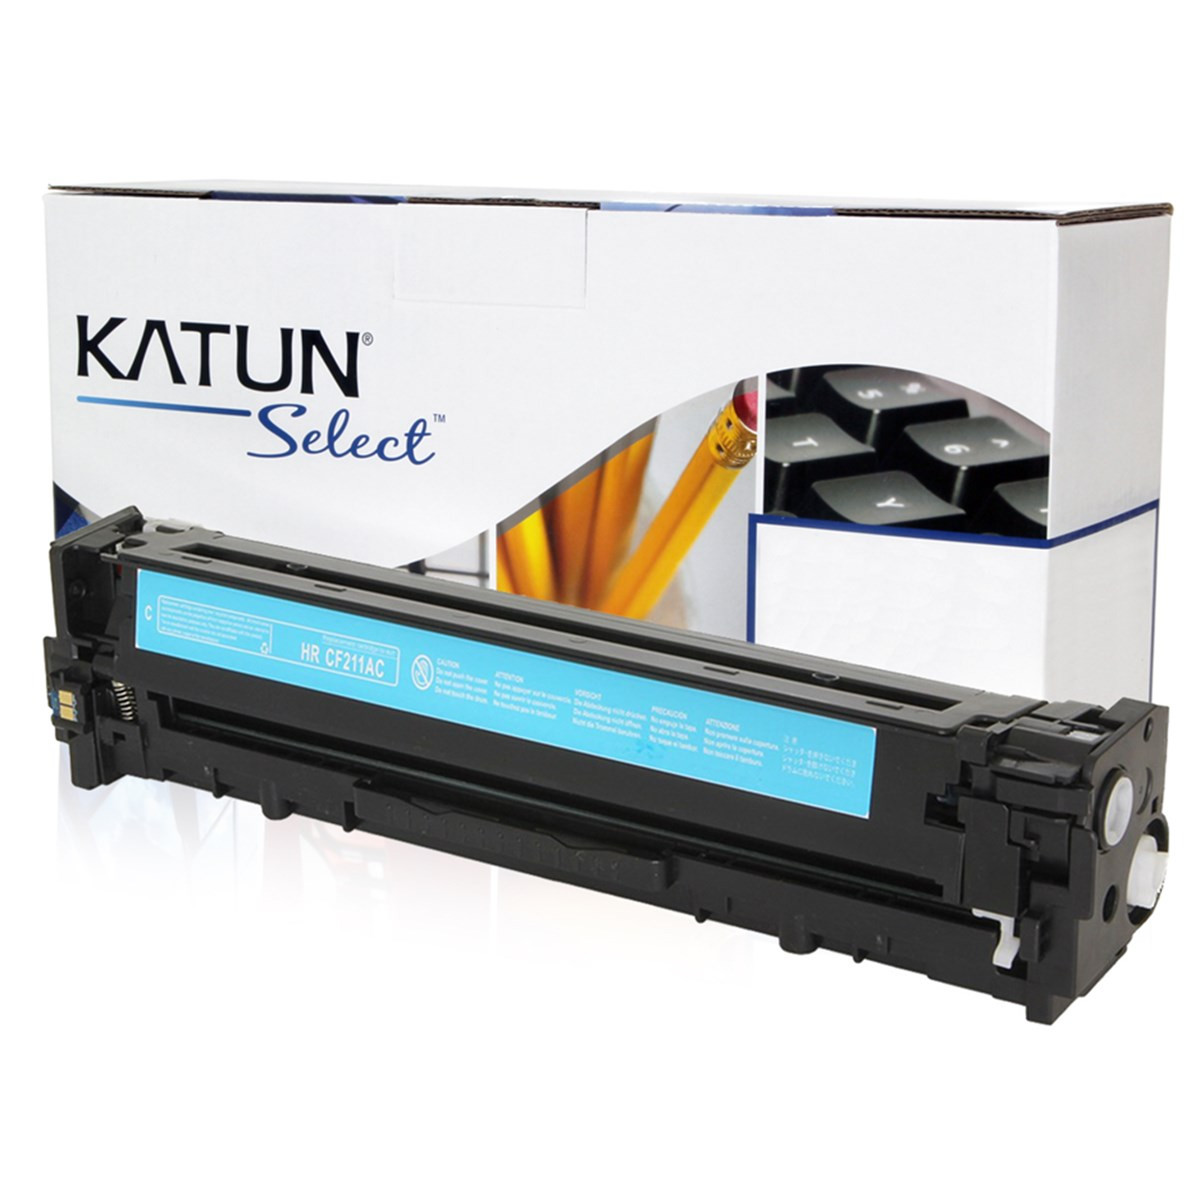 Toner Compatível com HP CF211A 131A Ciano | Pro 200 M276 M251NW M276N M276NW | Katun Select 1.8k